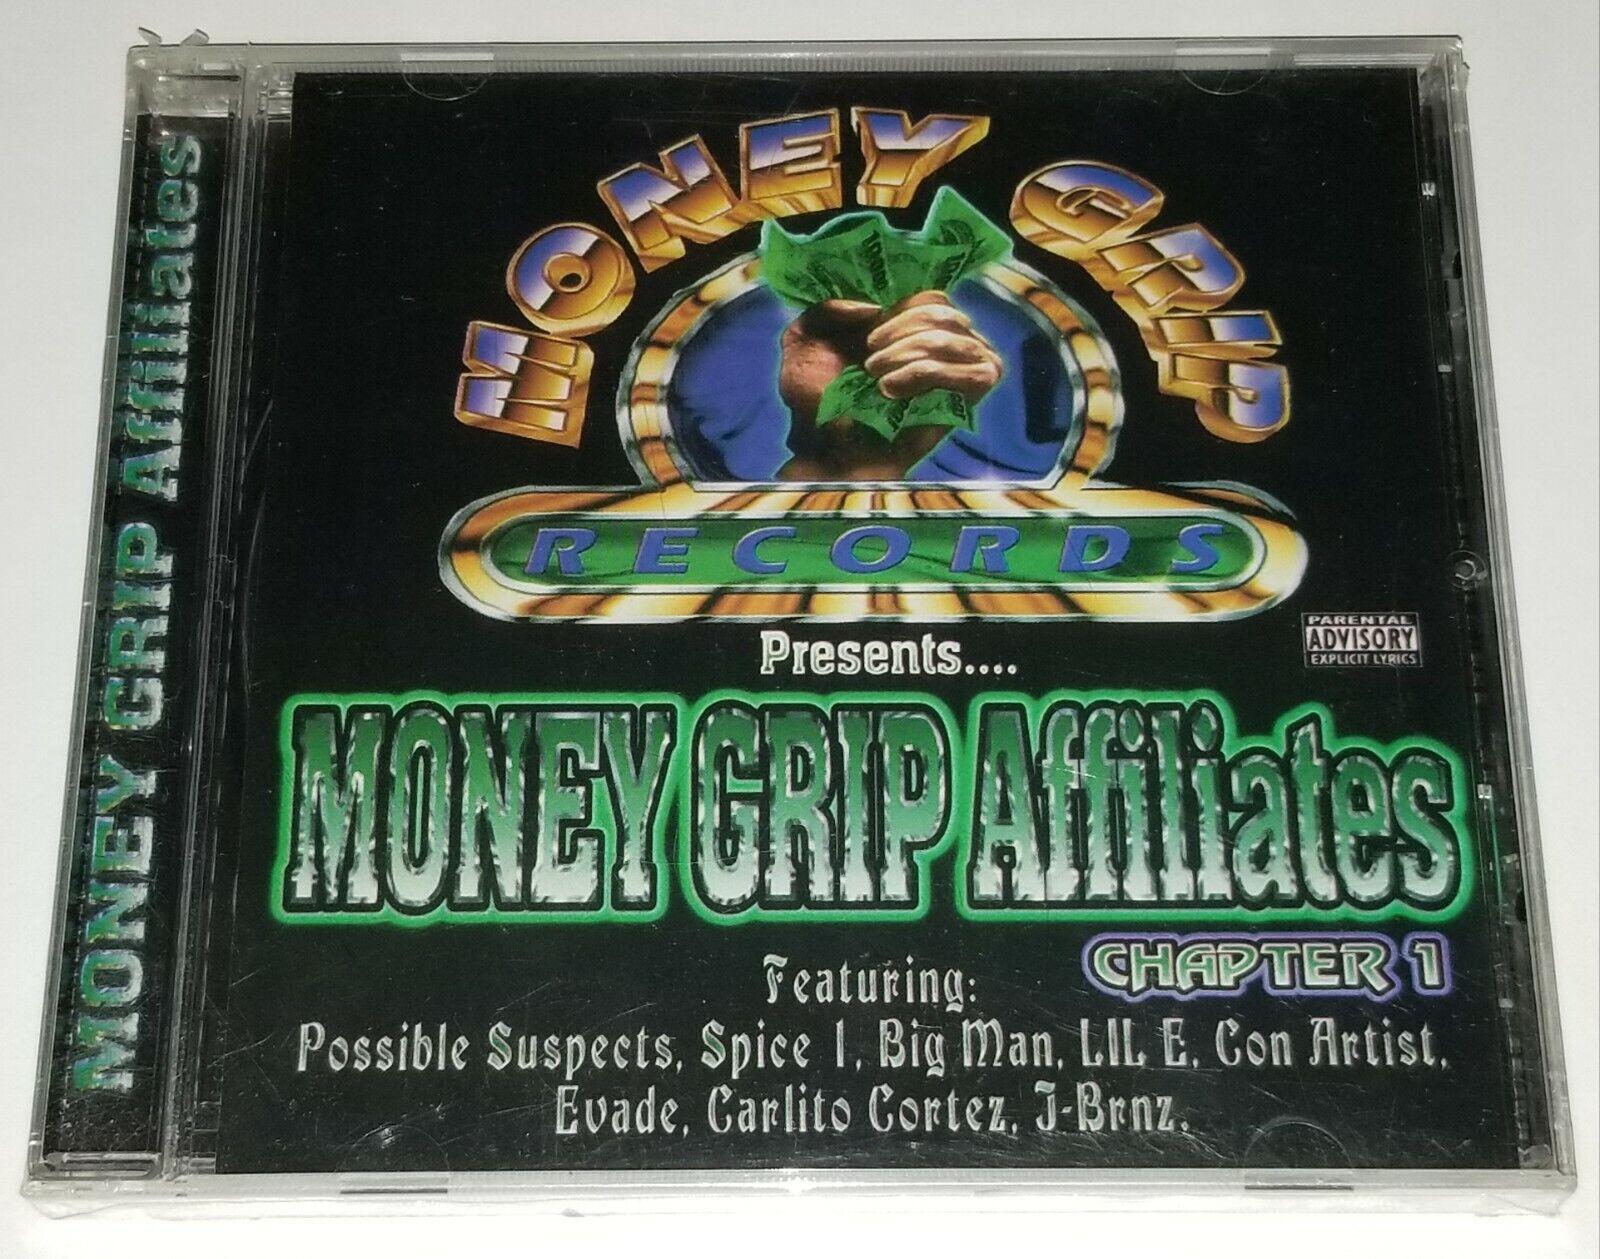 MONEY GRIP AFFILIATES SEALED RAP CD SPICE 1 C-NOTE G FUNK LATIN CHICANO LIL E Lp - $70.00